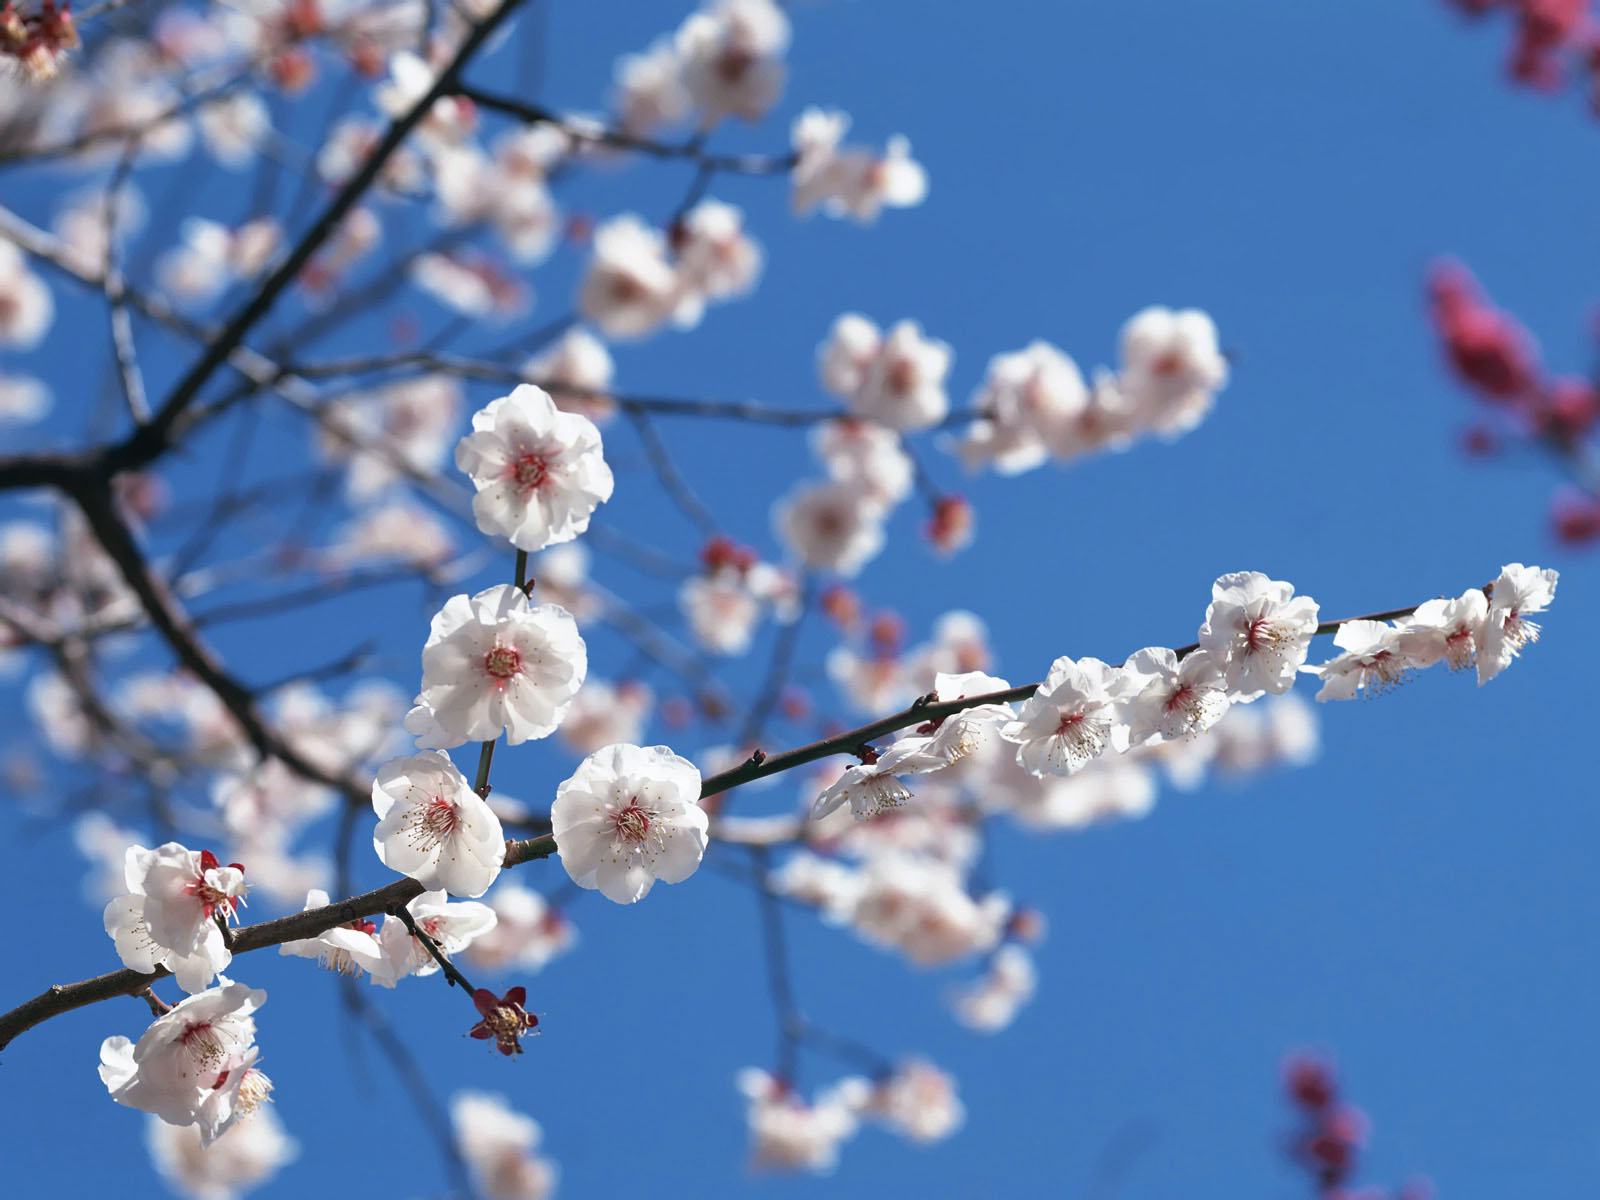 hinh-nen-hd-dep-hoa-anh-dao-Japanese_nice_wallpapers-windows-8_xuan-2013-456789